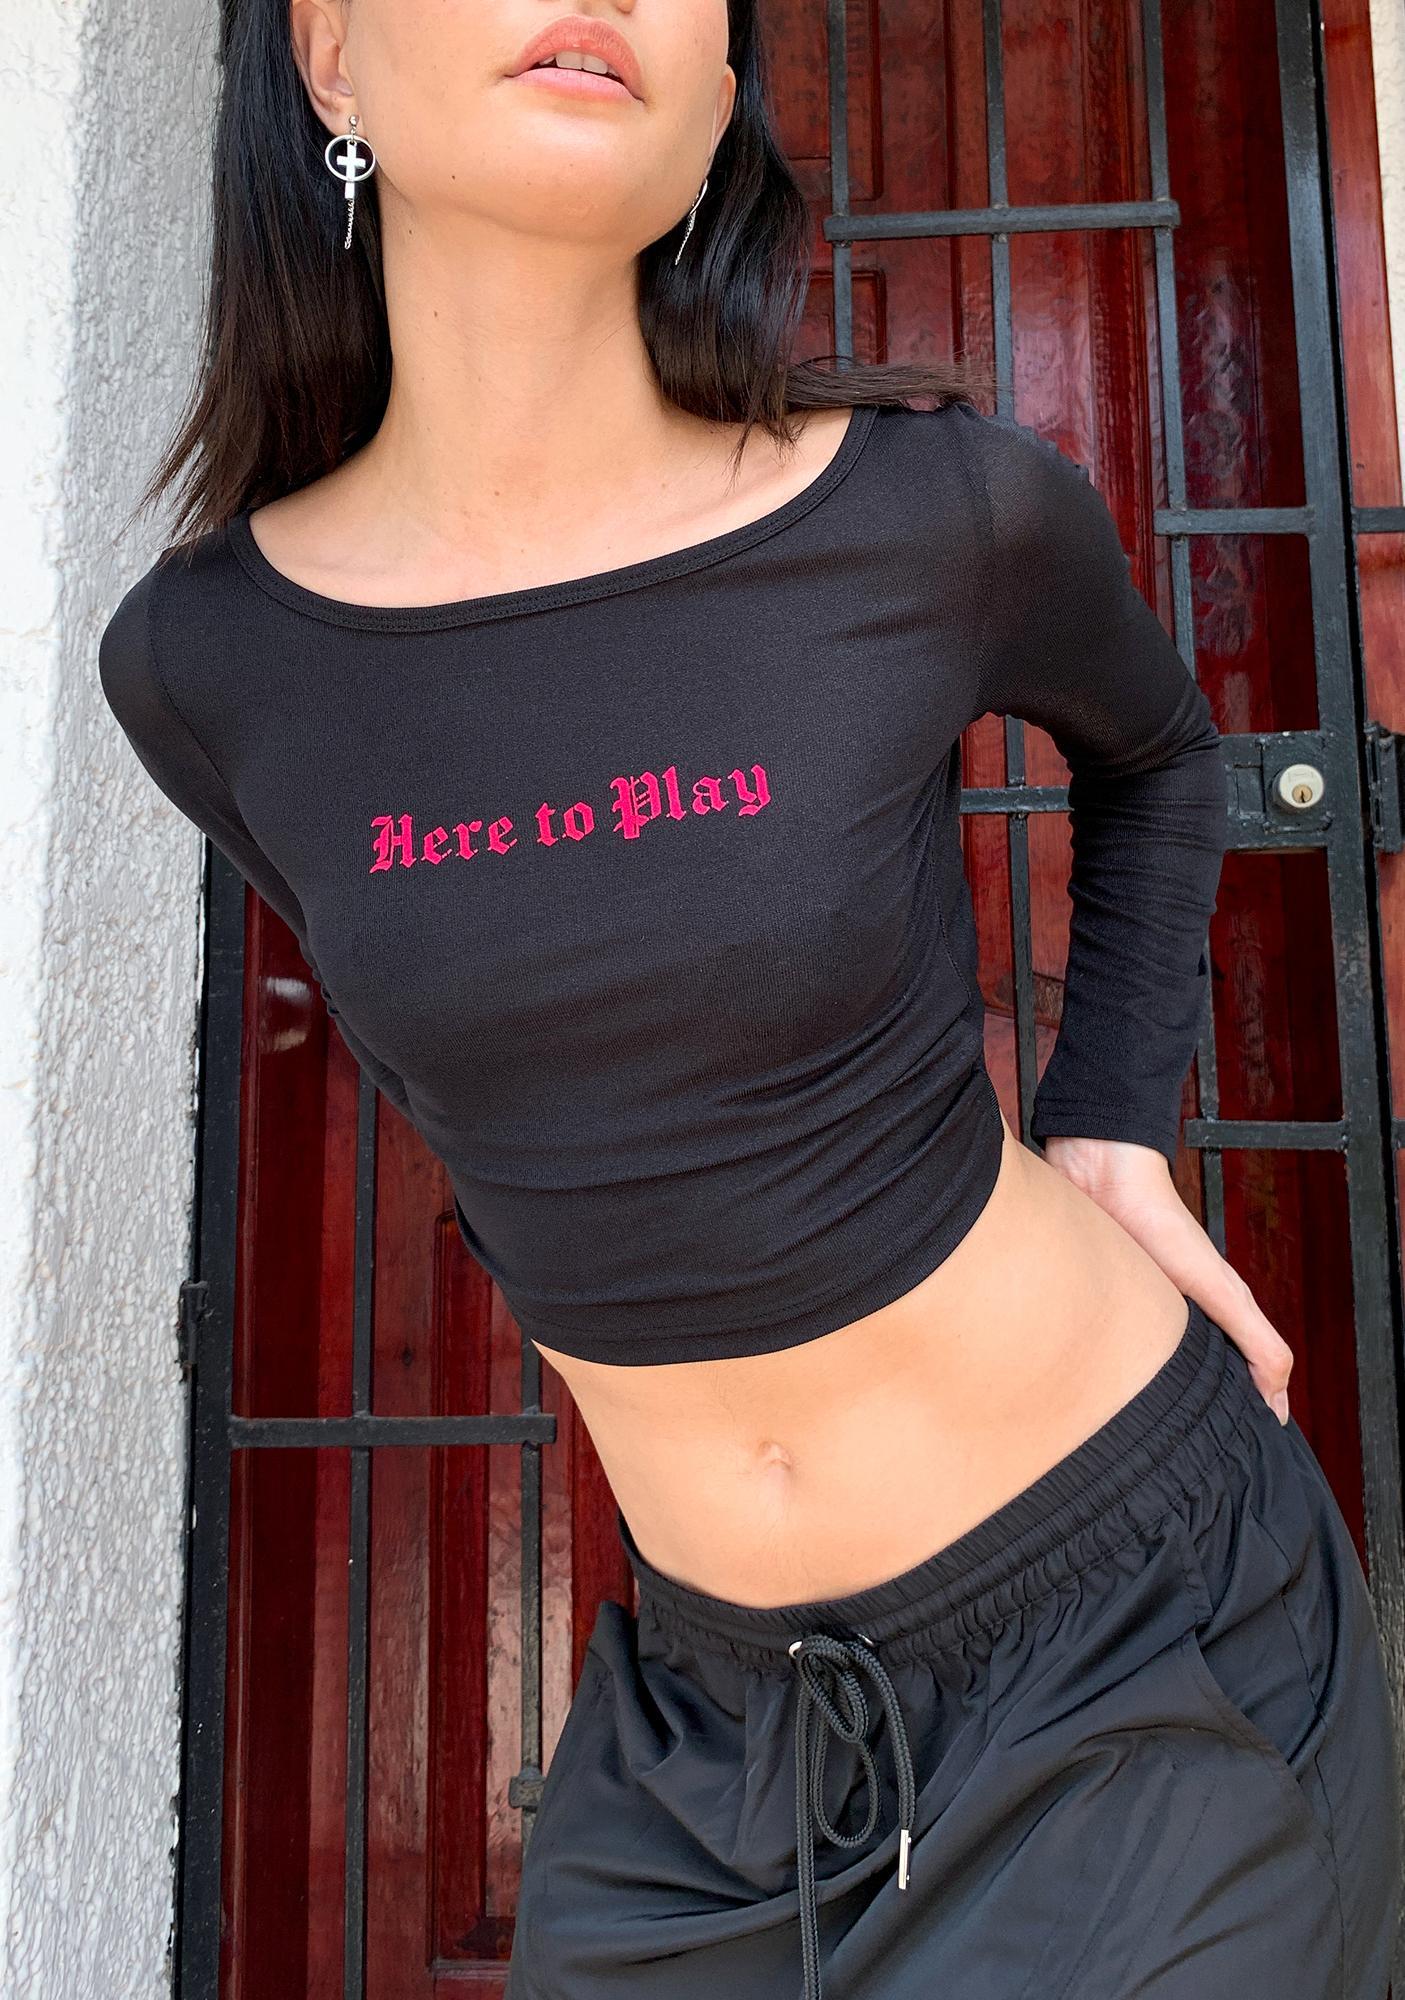 Poster Grl Playas 'Gon Play Crop Top